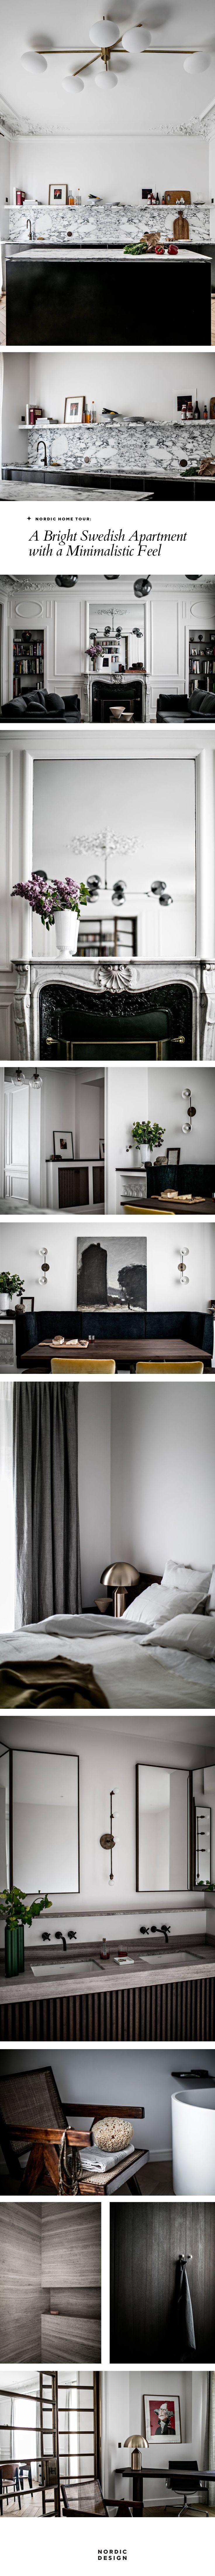 1013 best Inspiring interiors images on Pinterest | Home tours ...